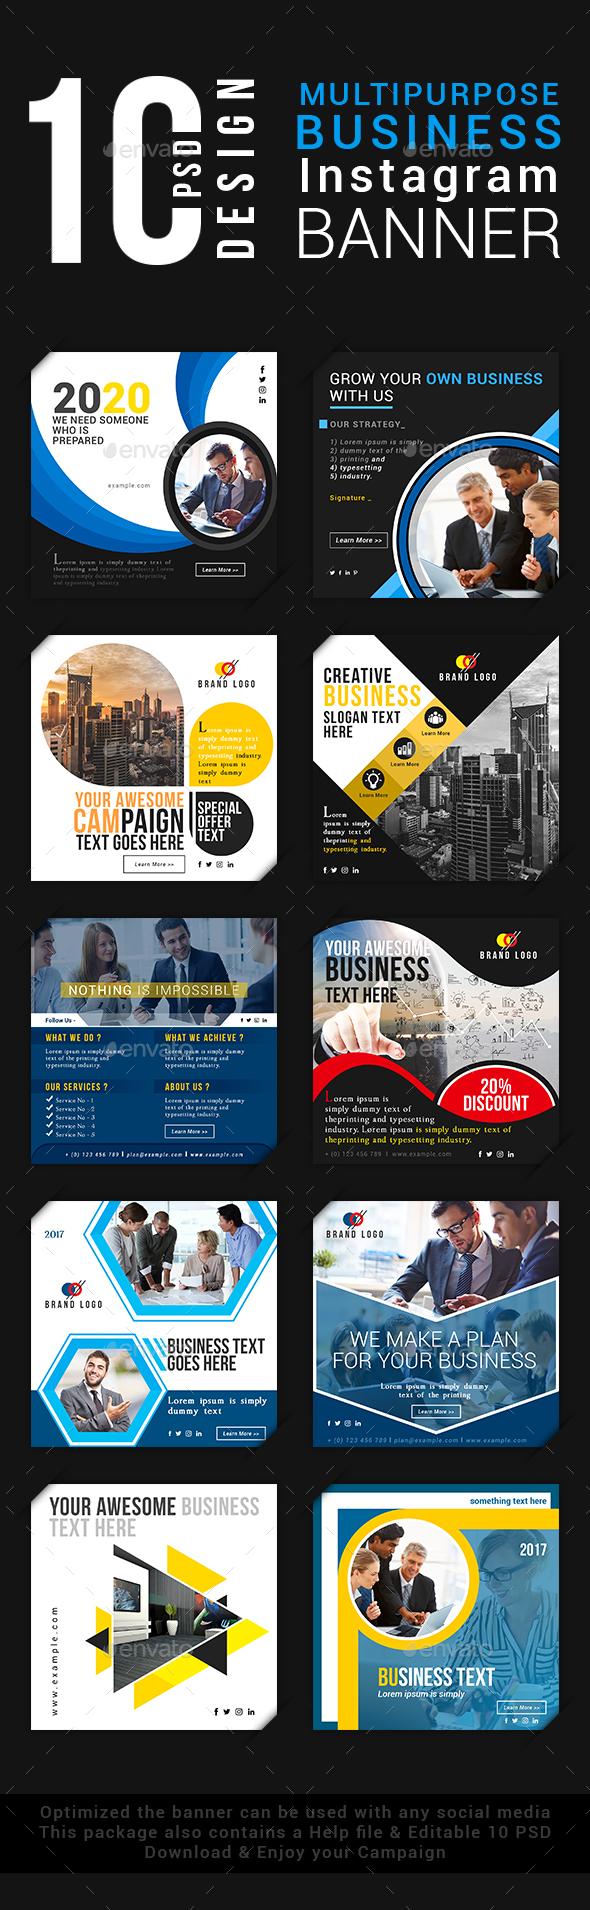 Multipurpose Business Instagram Banner - Social Media Web Elements